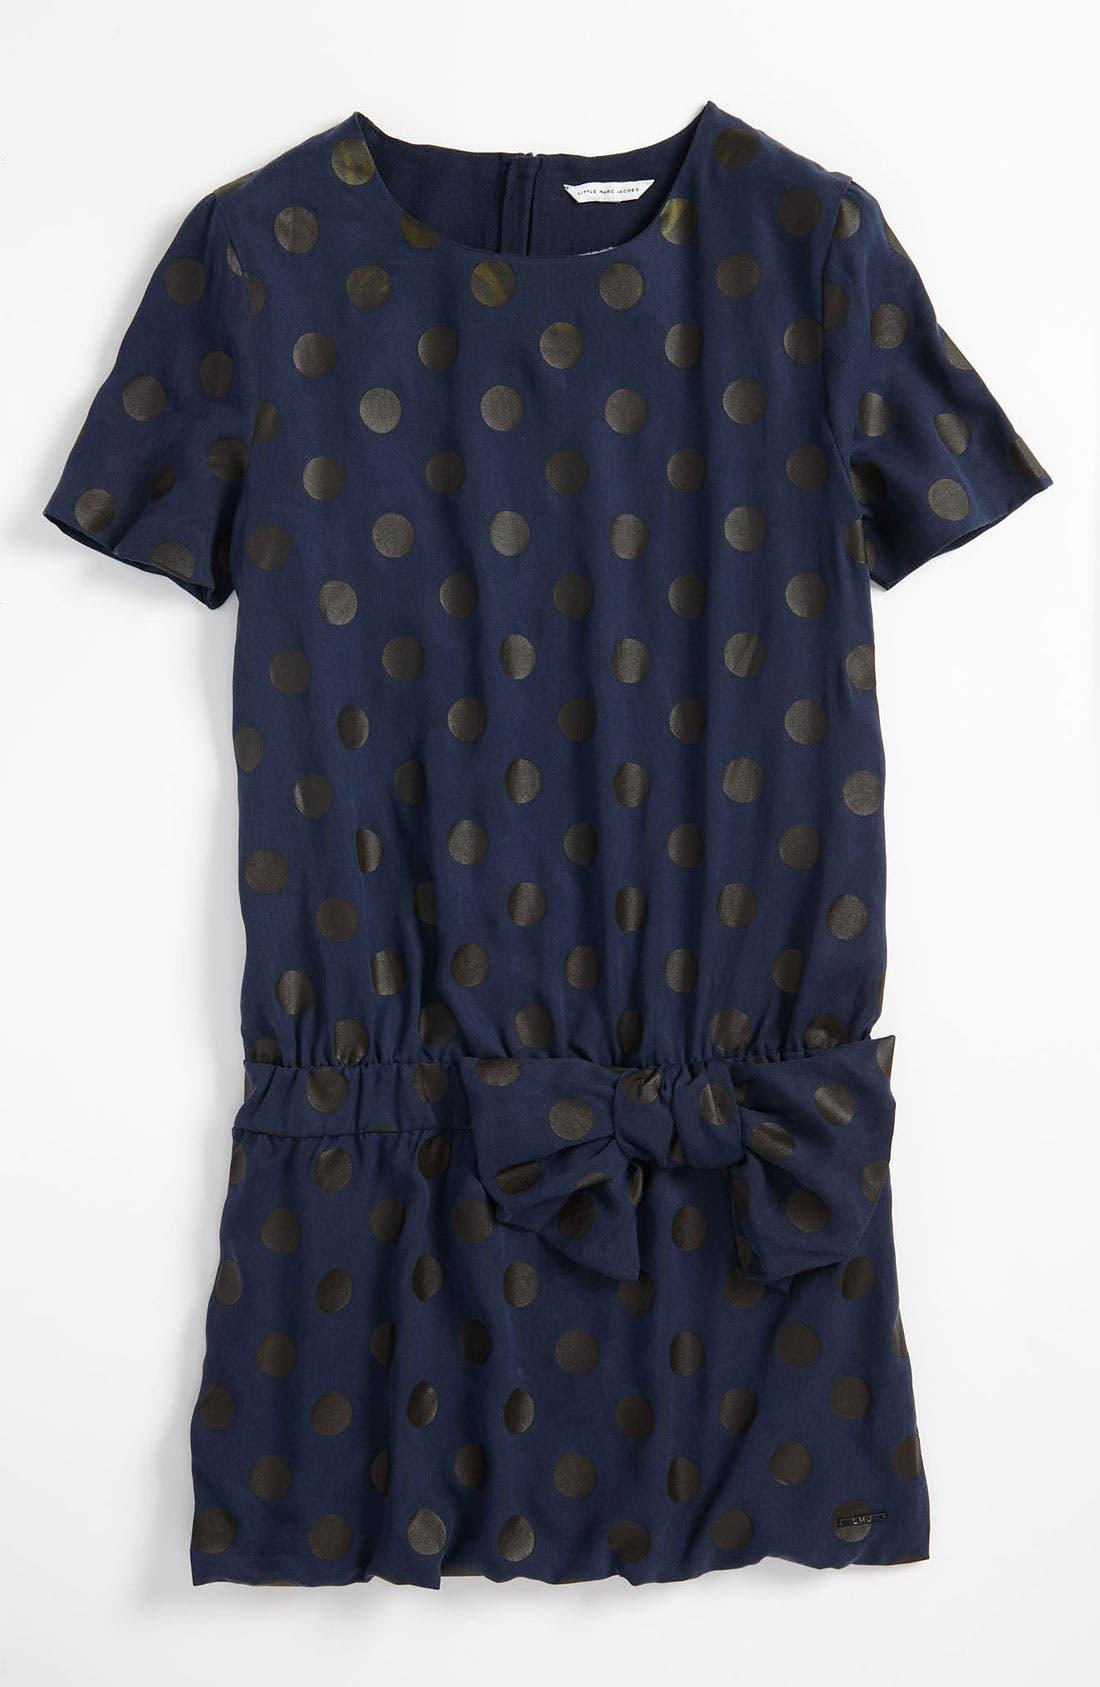 Main Image - LITTLE MARC JACOBS Polka Dot Dress (Little Girls & Big Girls)